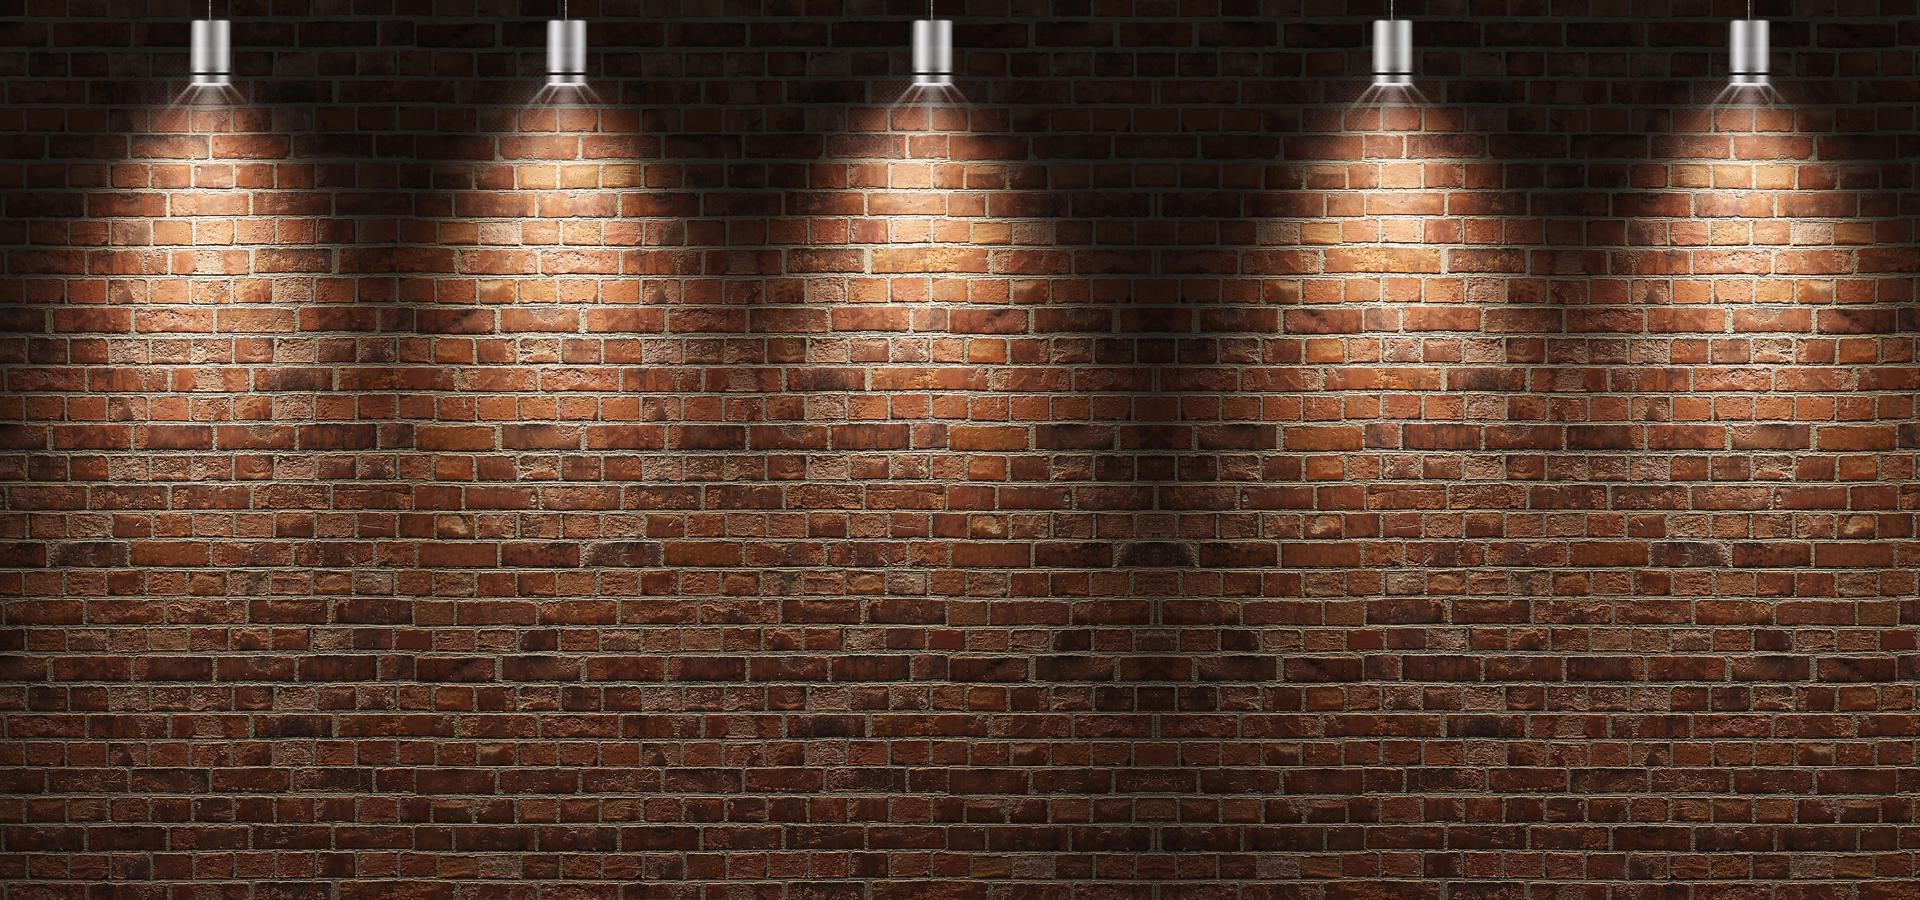 brick walls background lighting  brick  walls  flashlight